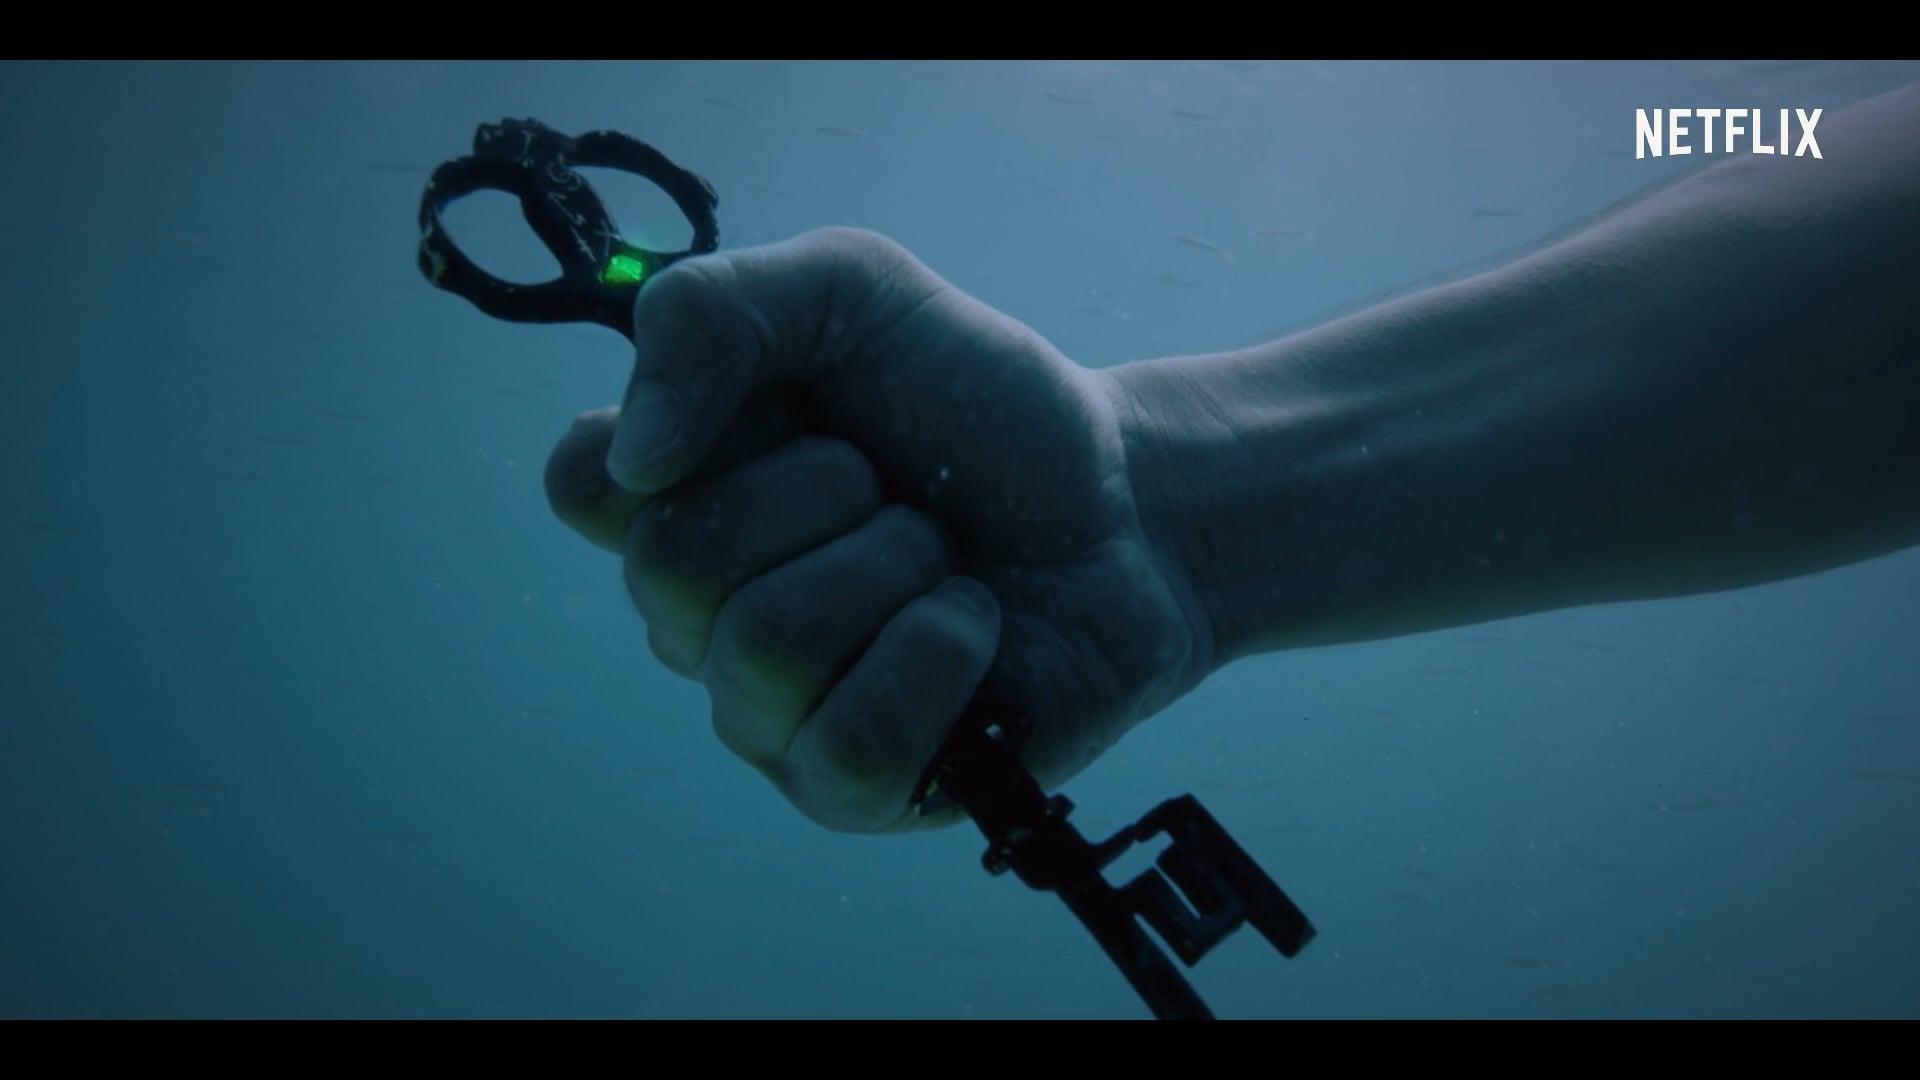 Netflix Series 'The Protector' Season 4 Trailer